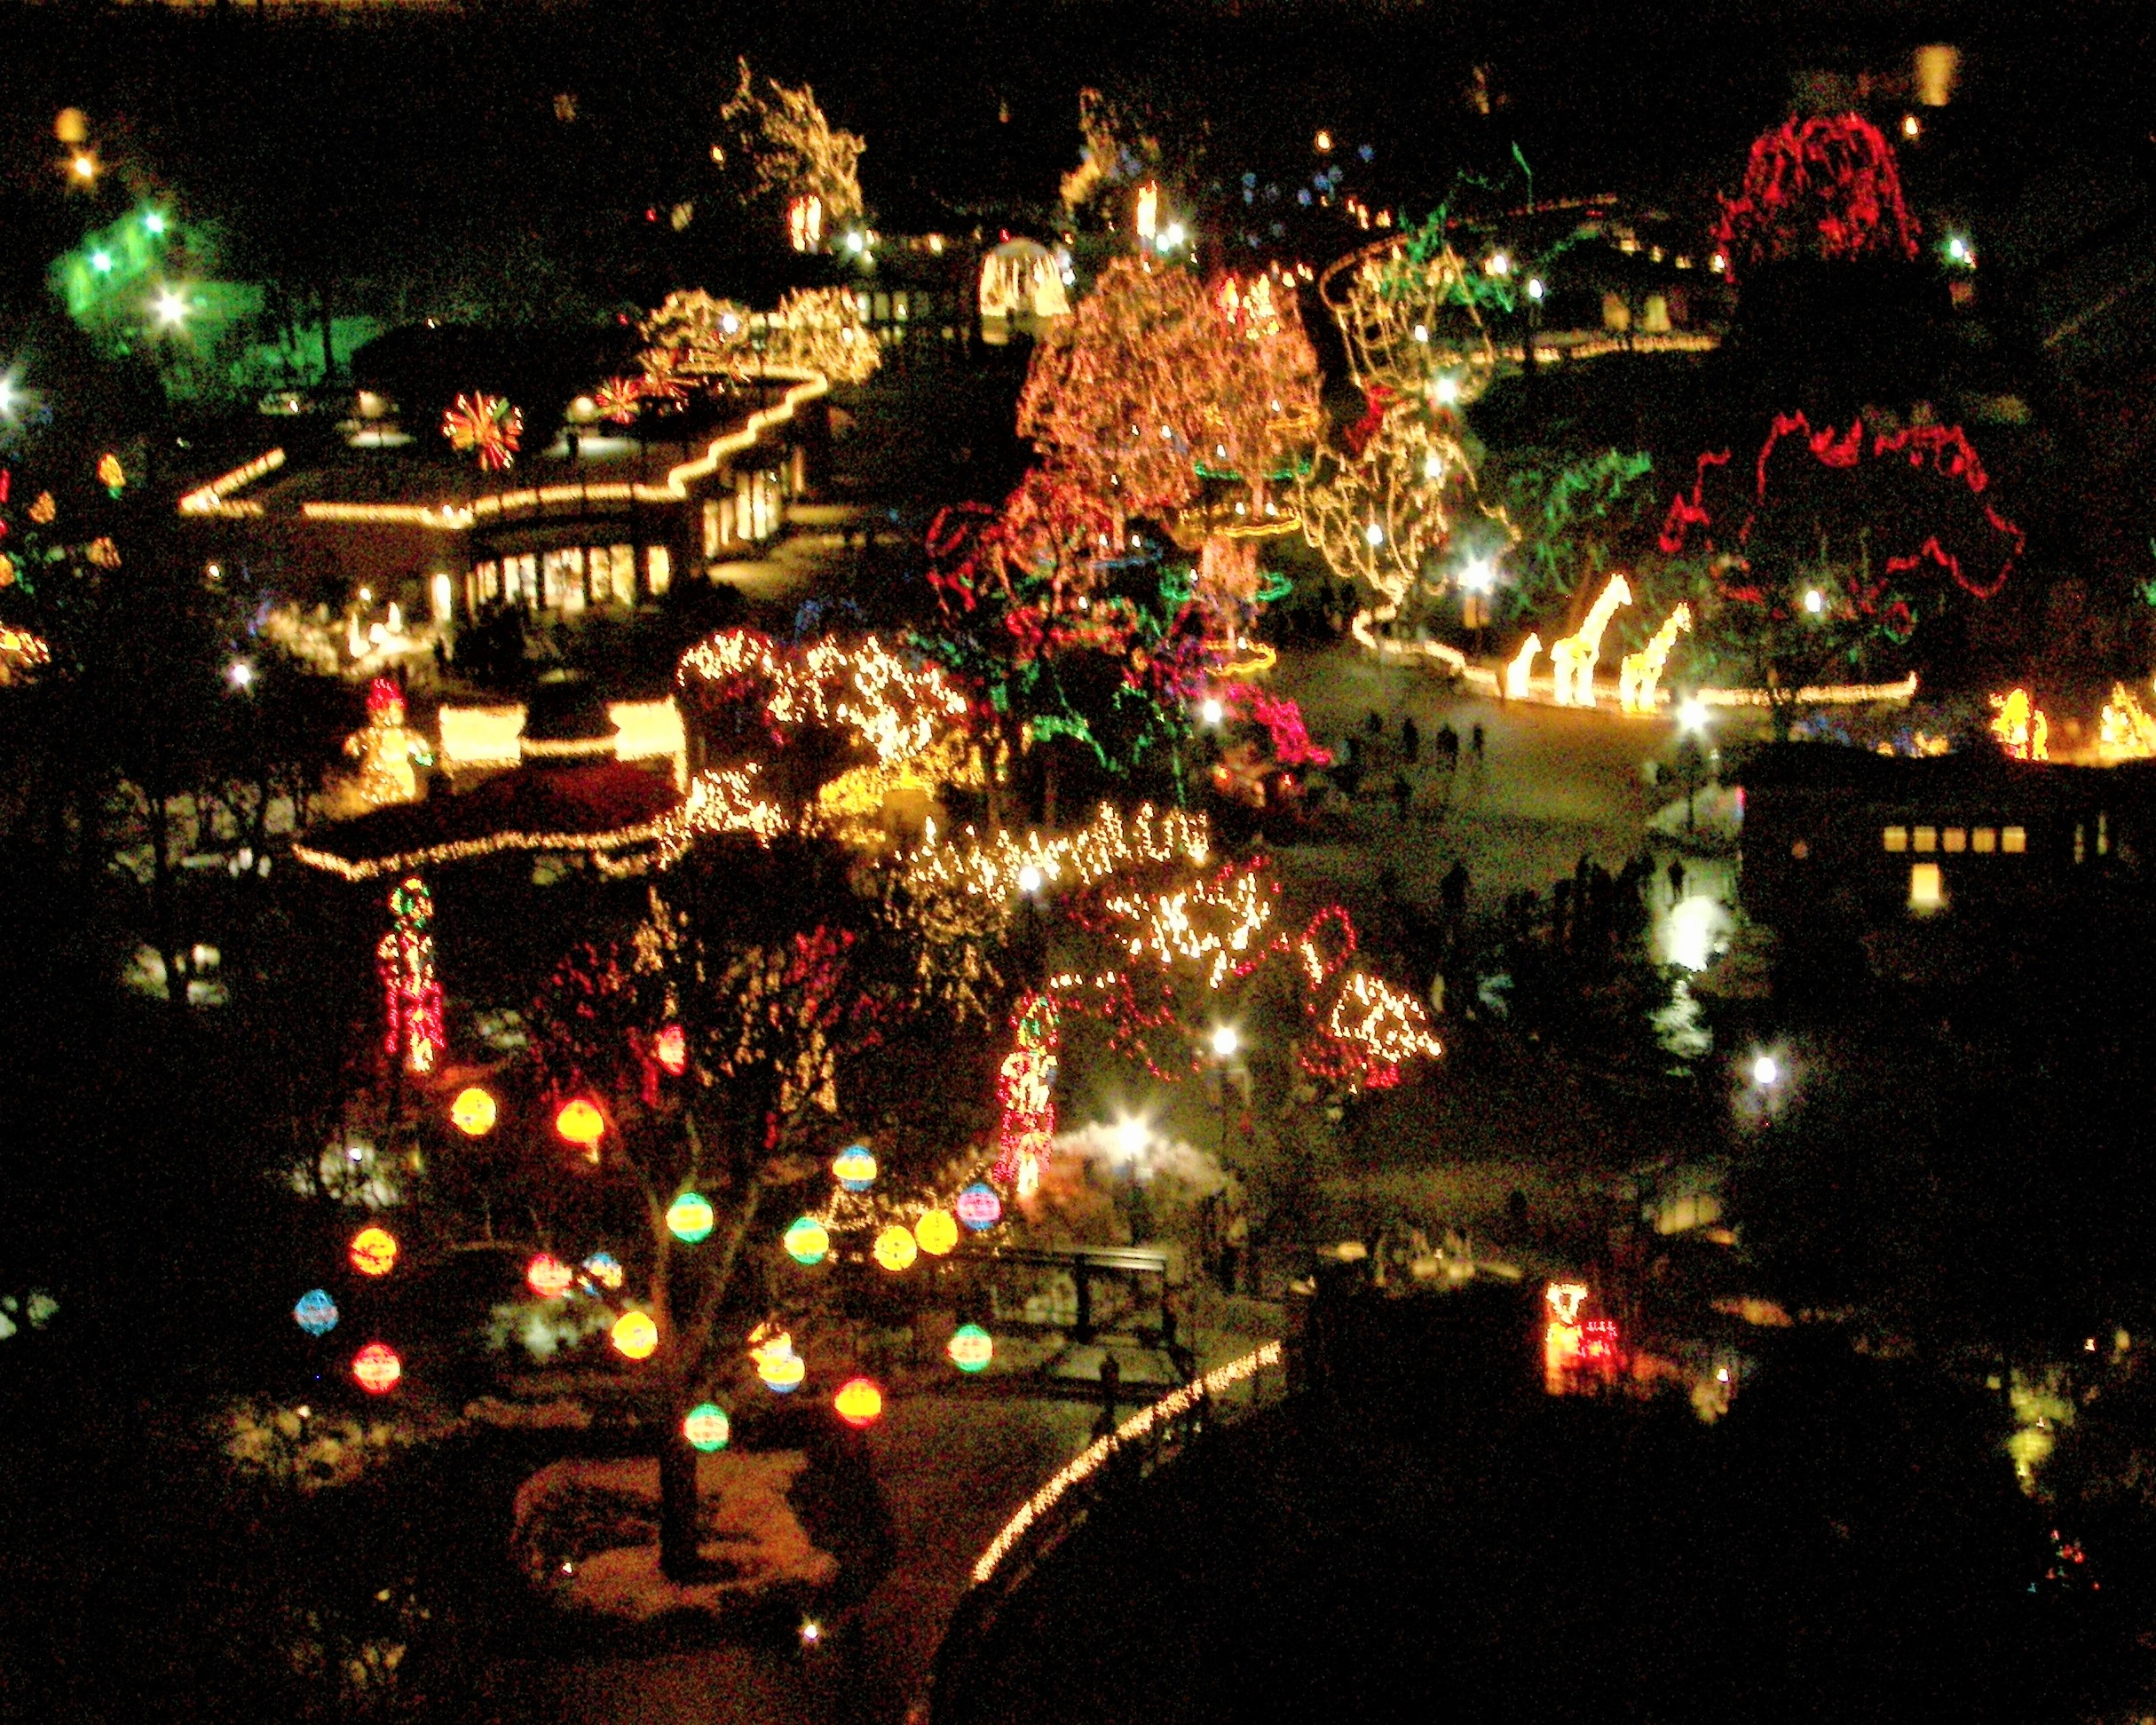 Festive Lincoln Park Zoo - Steve Morse